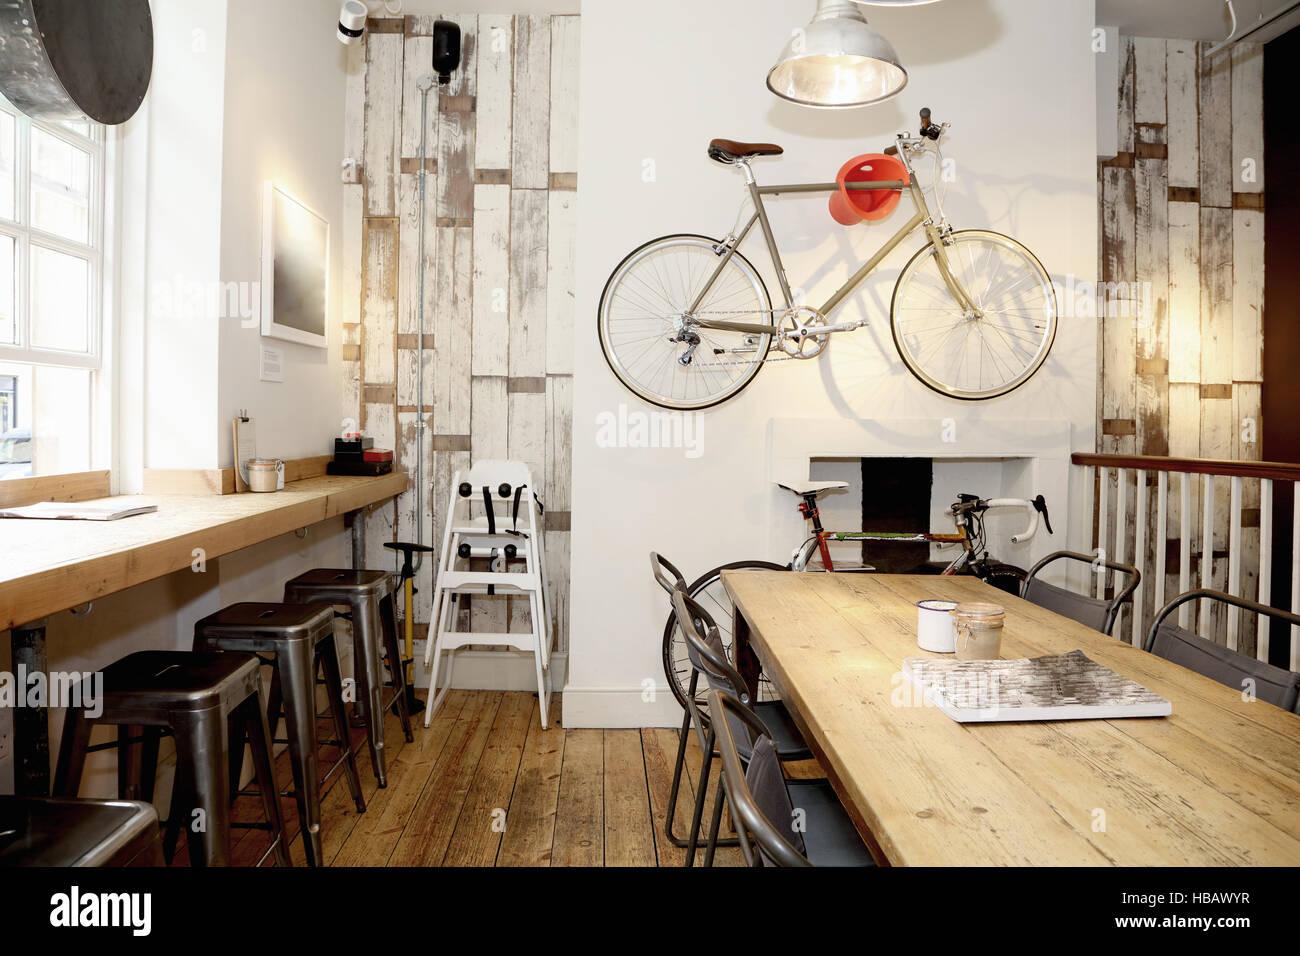 Bicycle Shop Interior Stock Photos Amp Bicycle Shop Interior